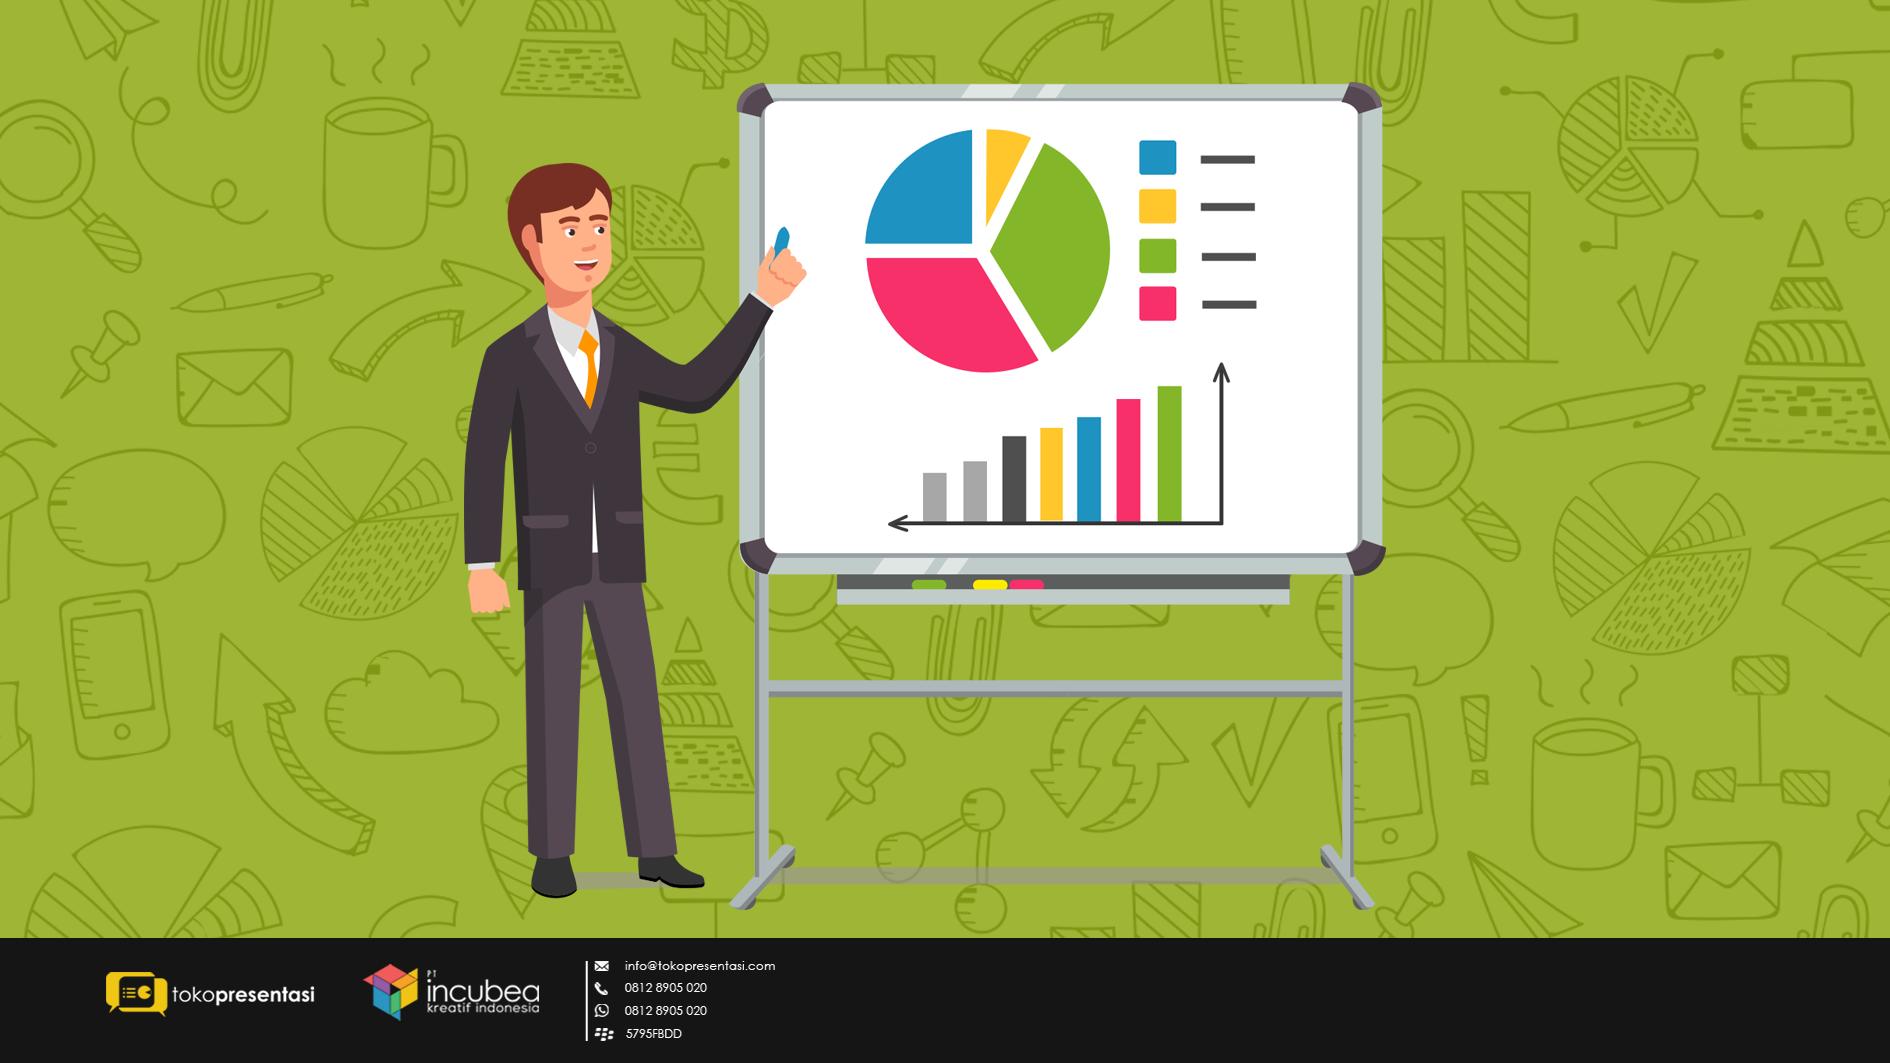 Jasa Pembuatan Presentasi Powerpoint Infografis - Tokopresentasi